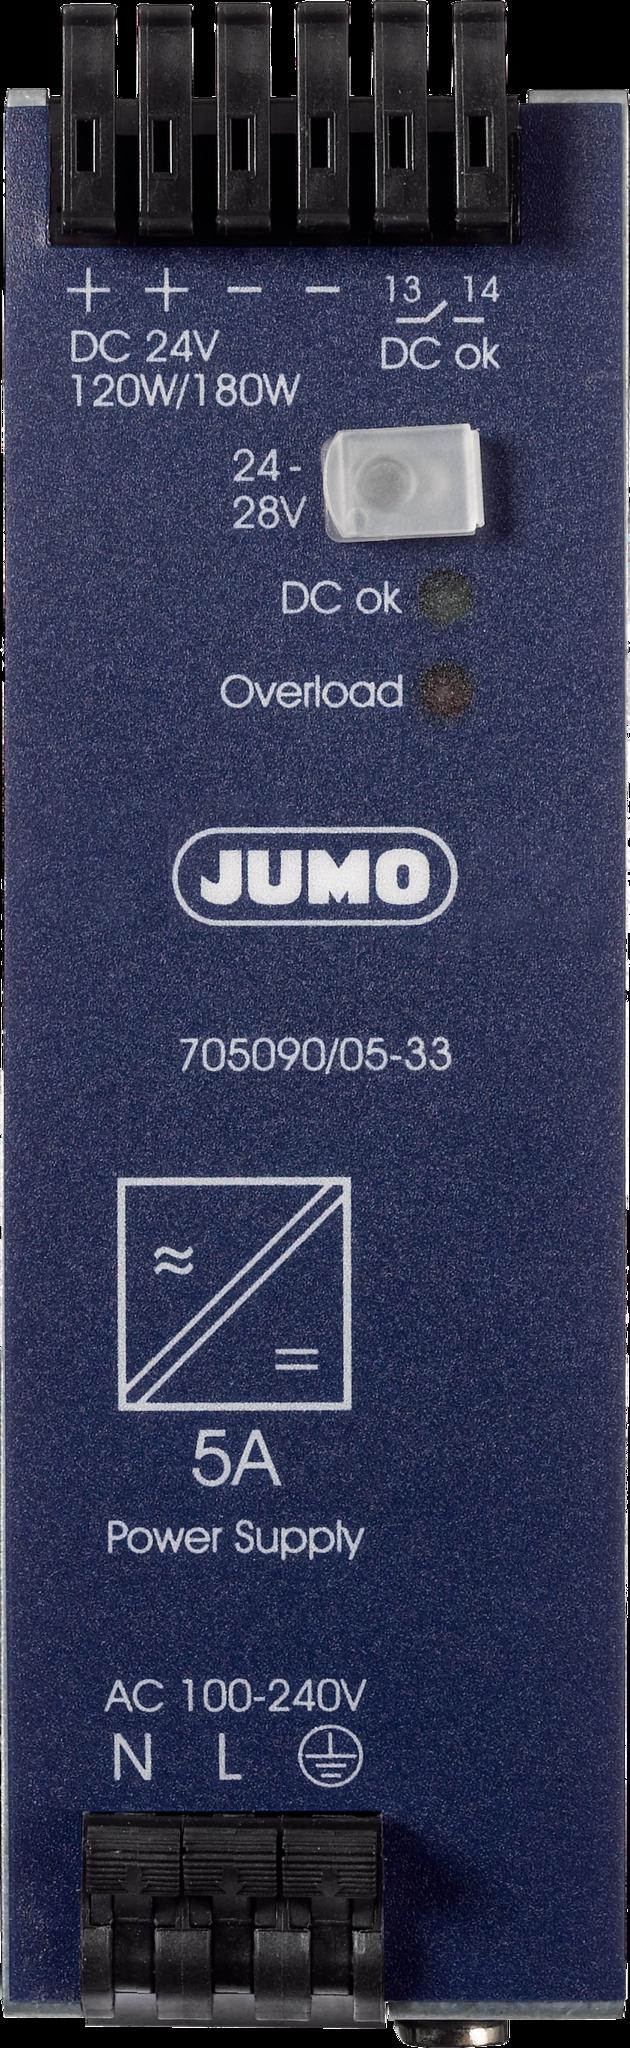 JUMO mTRON T